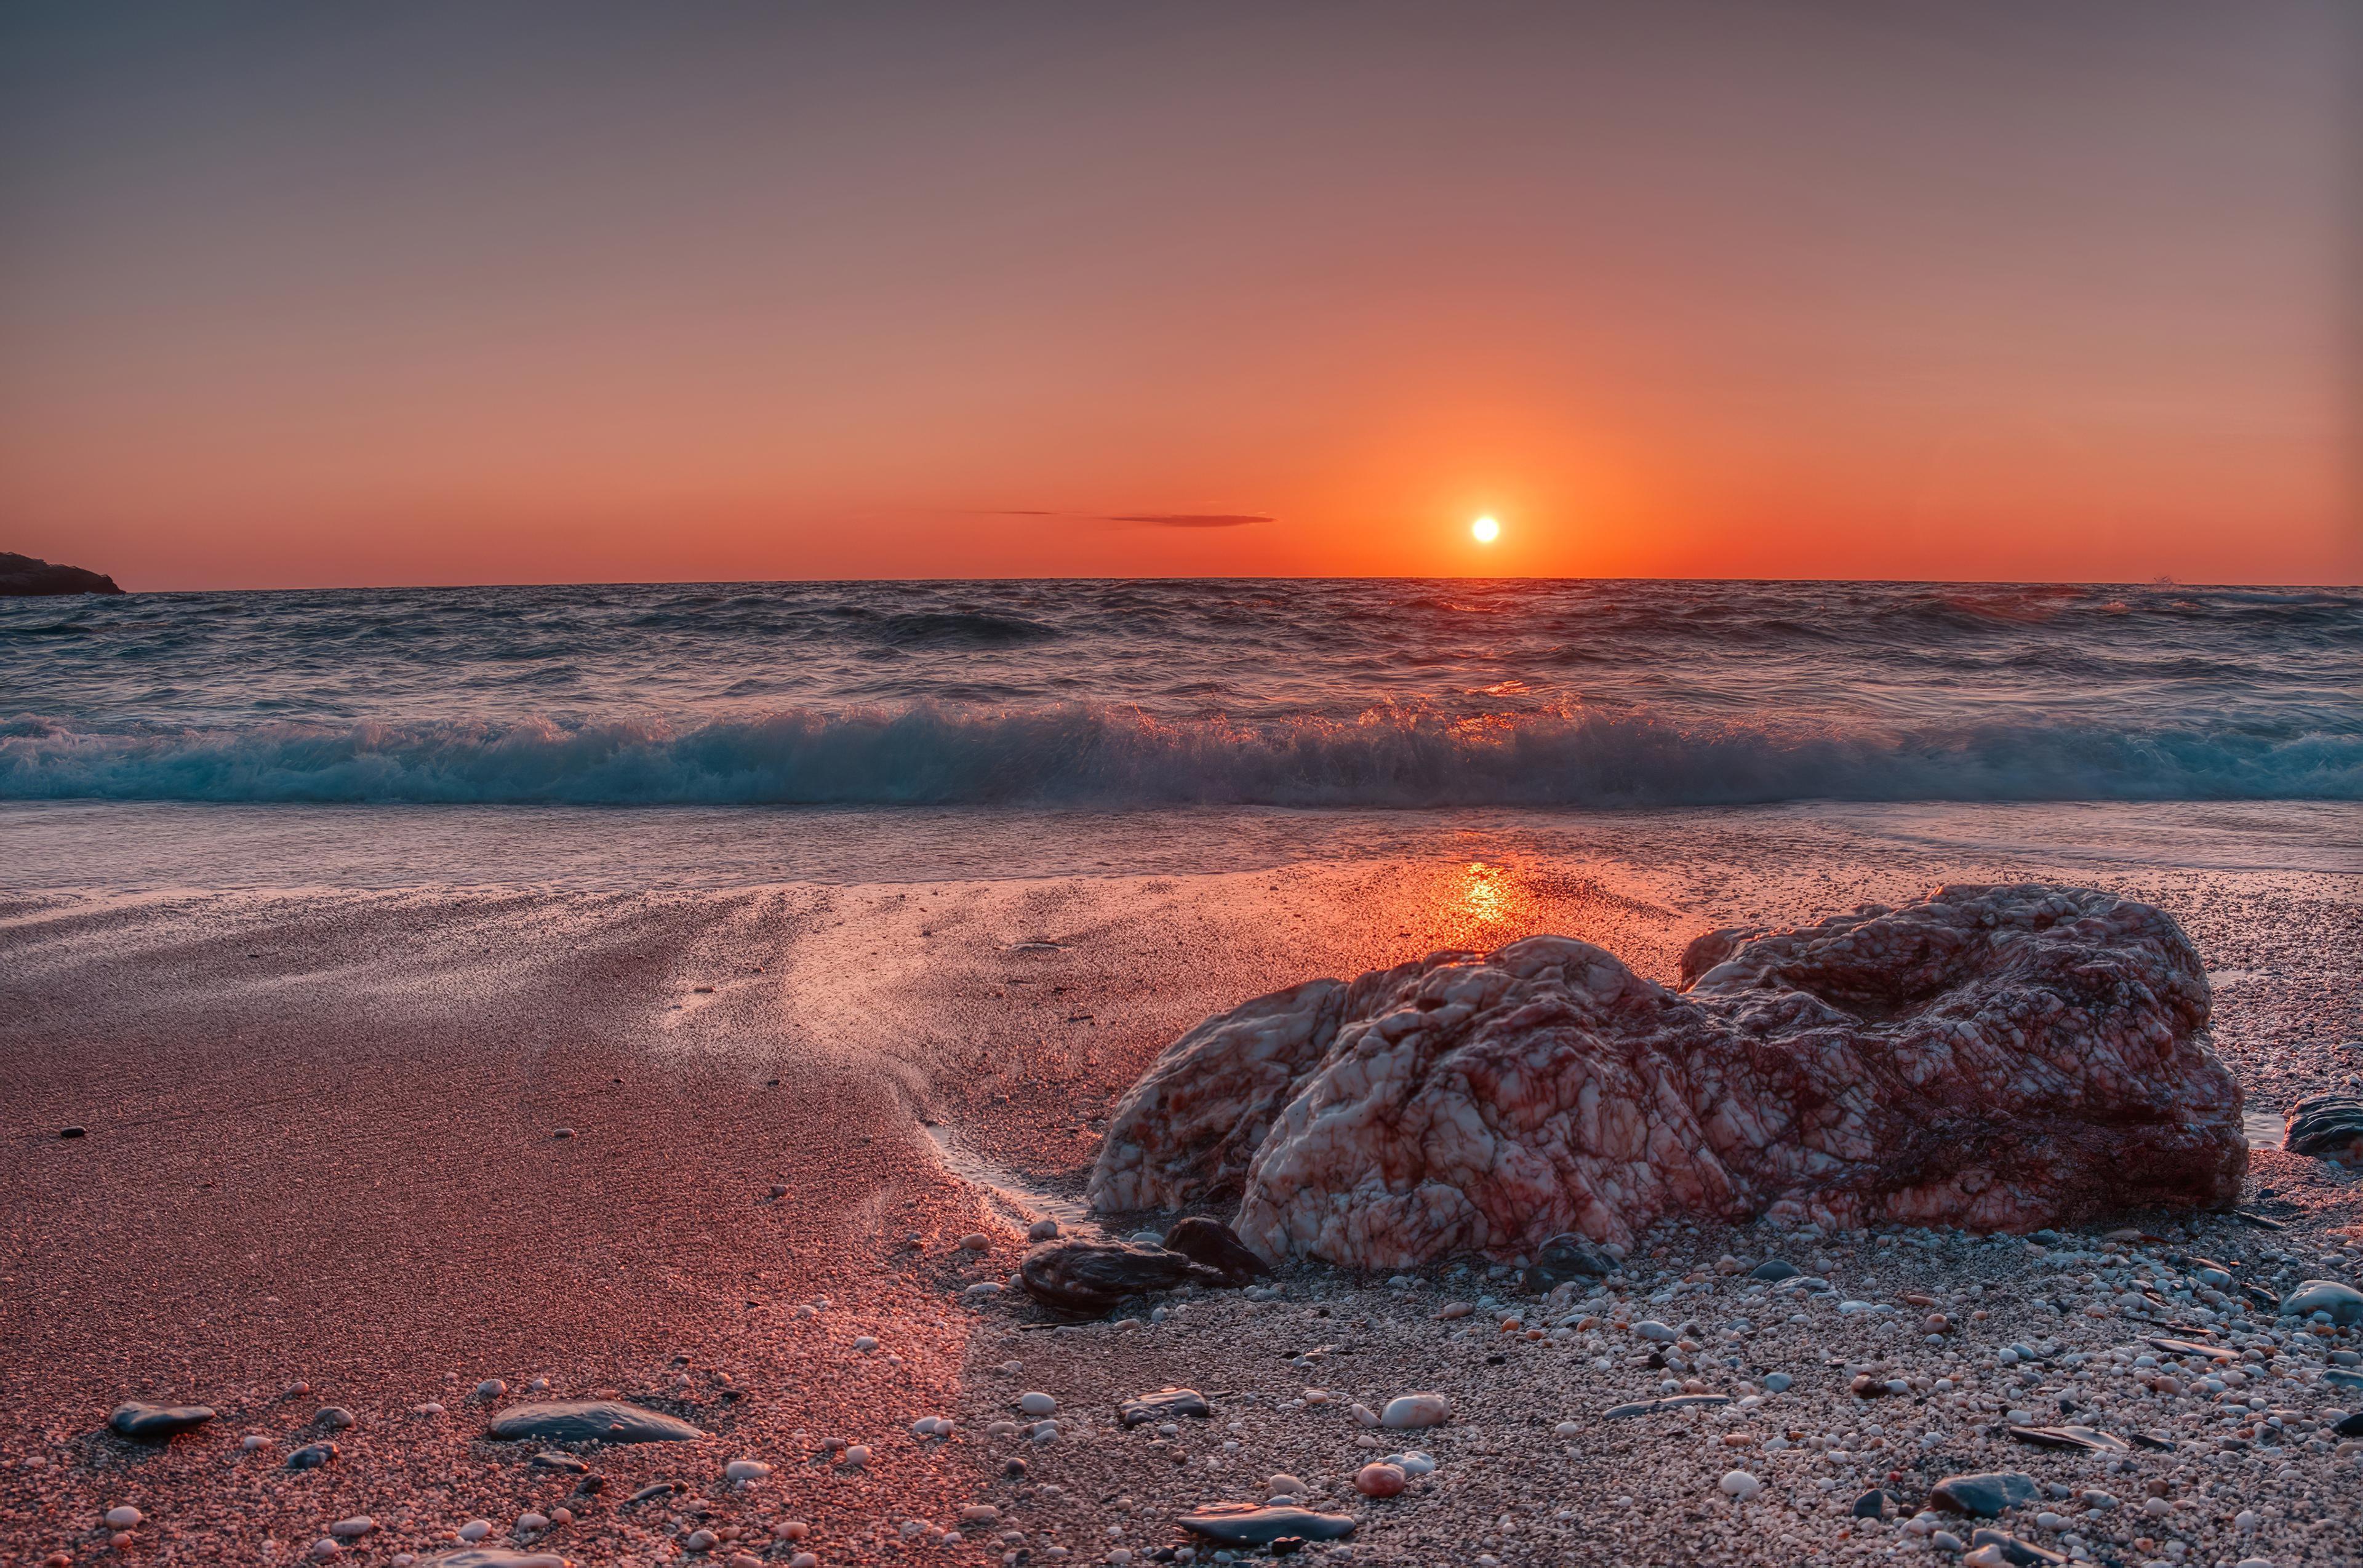 sea sunset 1579381454 - Sea Sunset - Sea Sunset wallpapers 4k, Sea Sunset landscape wallpapers 4k, Sea Sunset 4k wallpapers